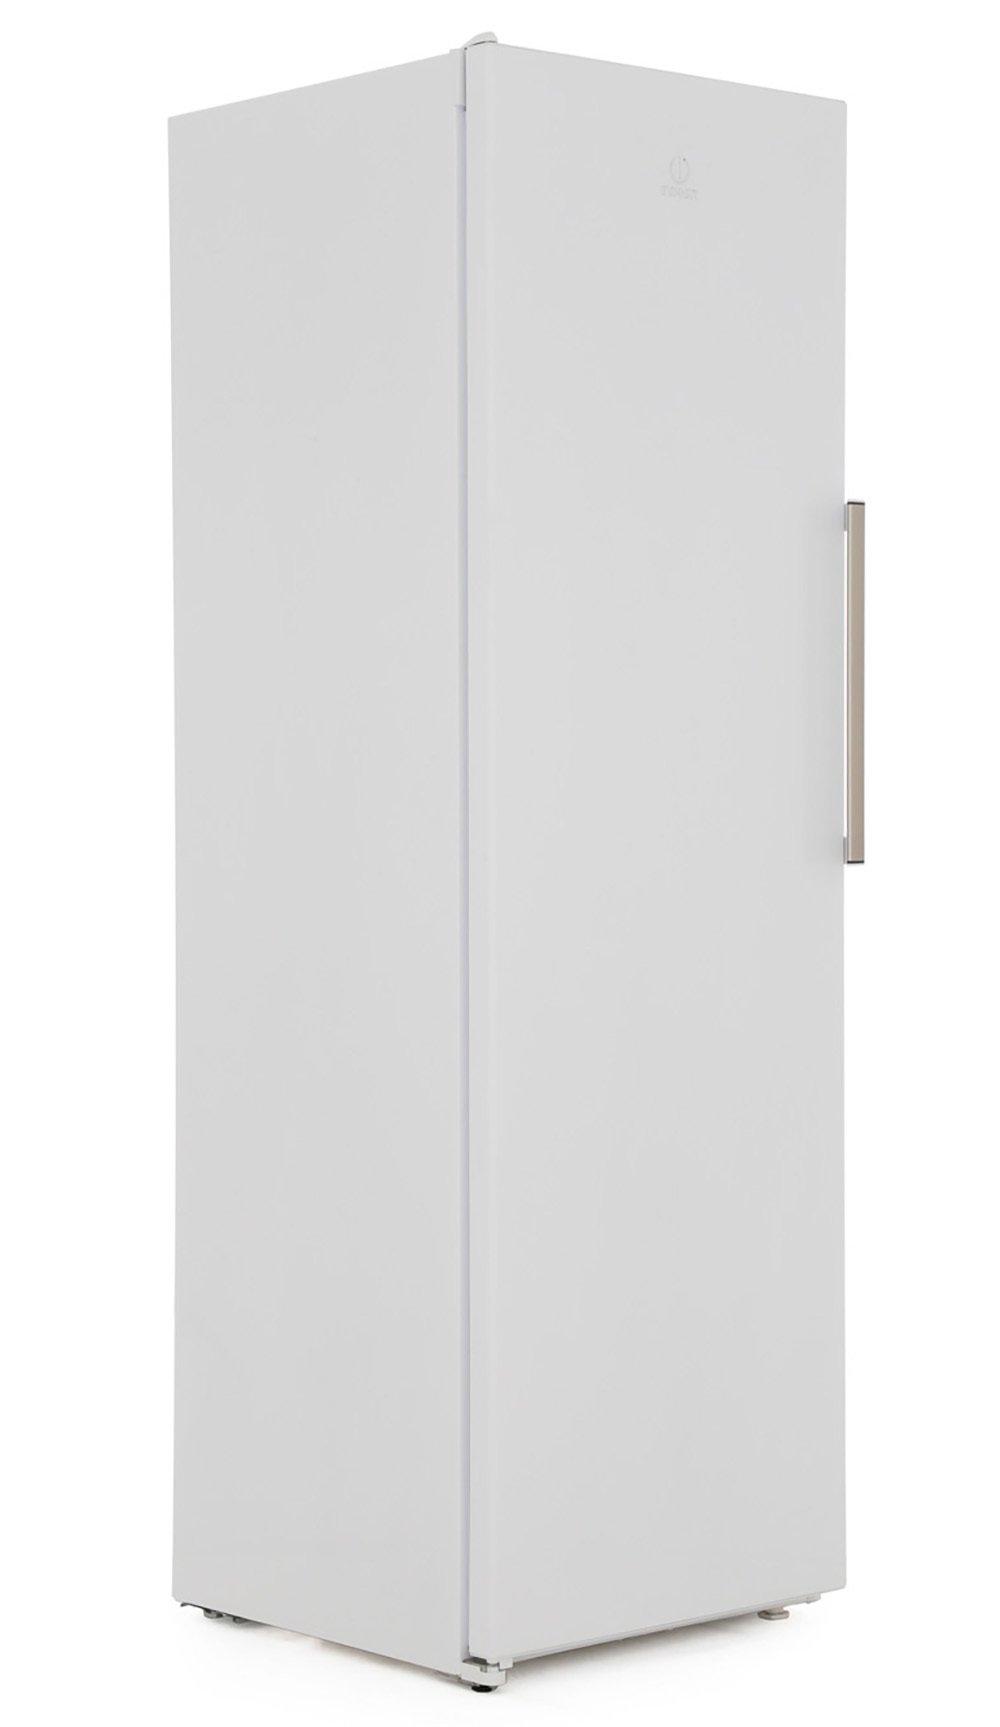 Indesit UI8 F1C W UK.1 Frost Free Tall Freezer